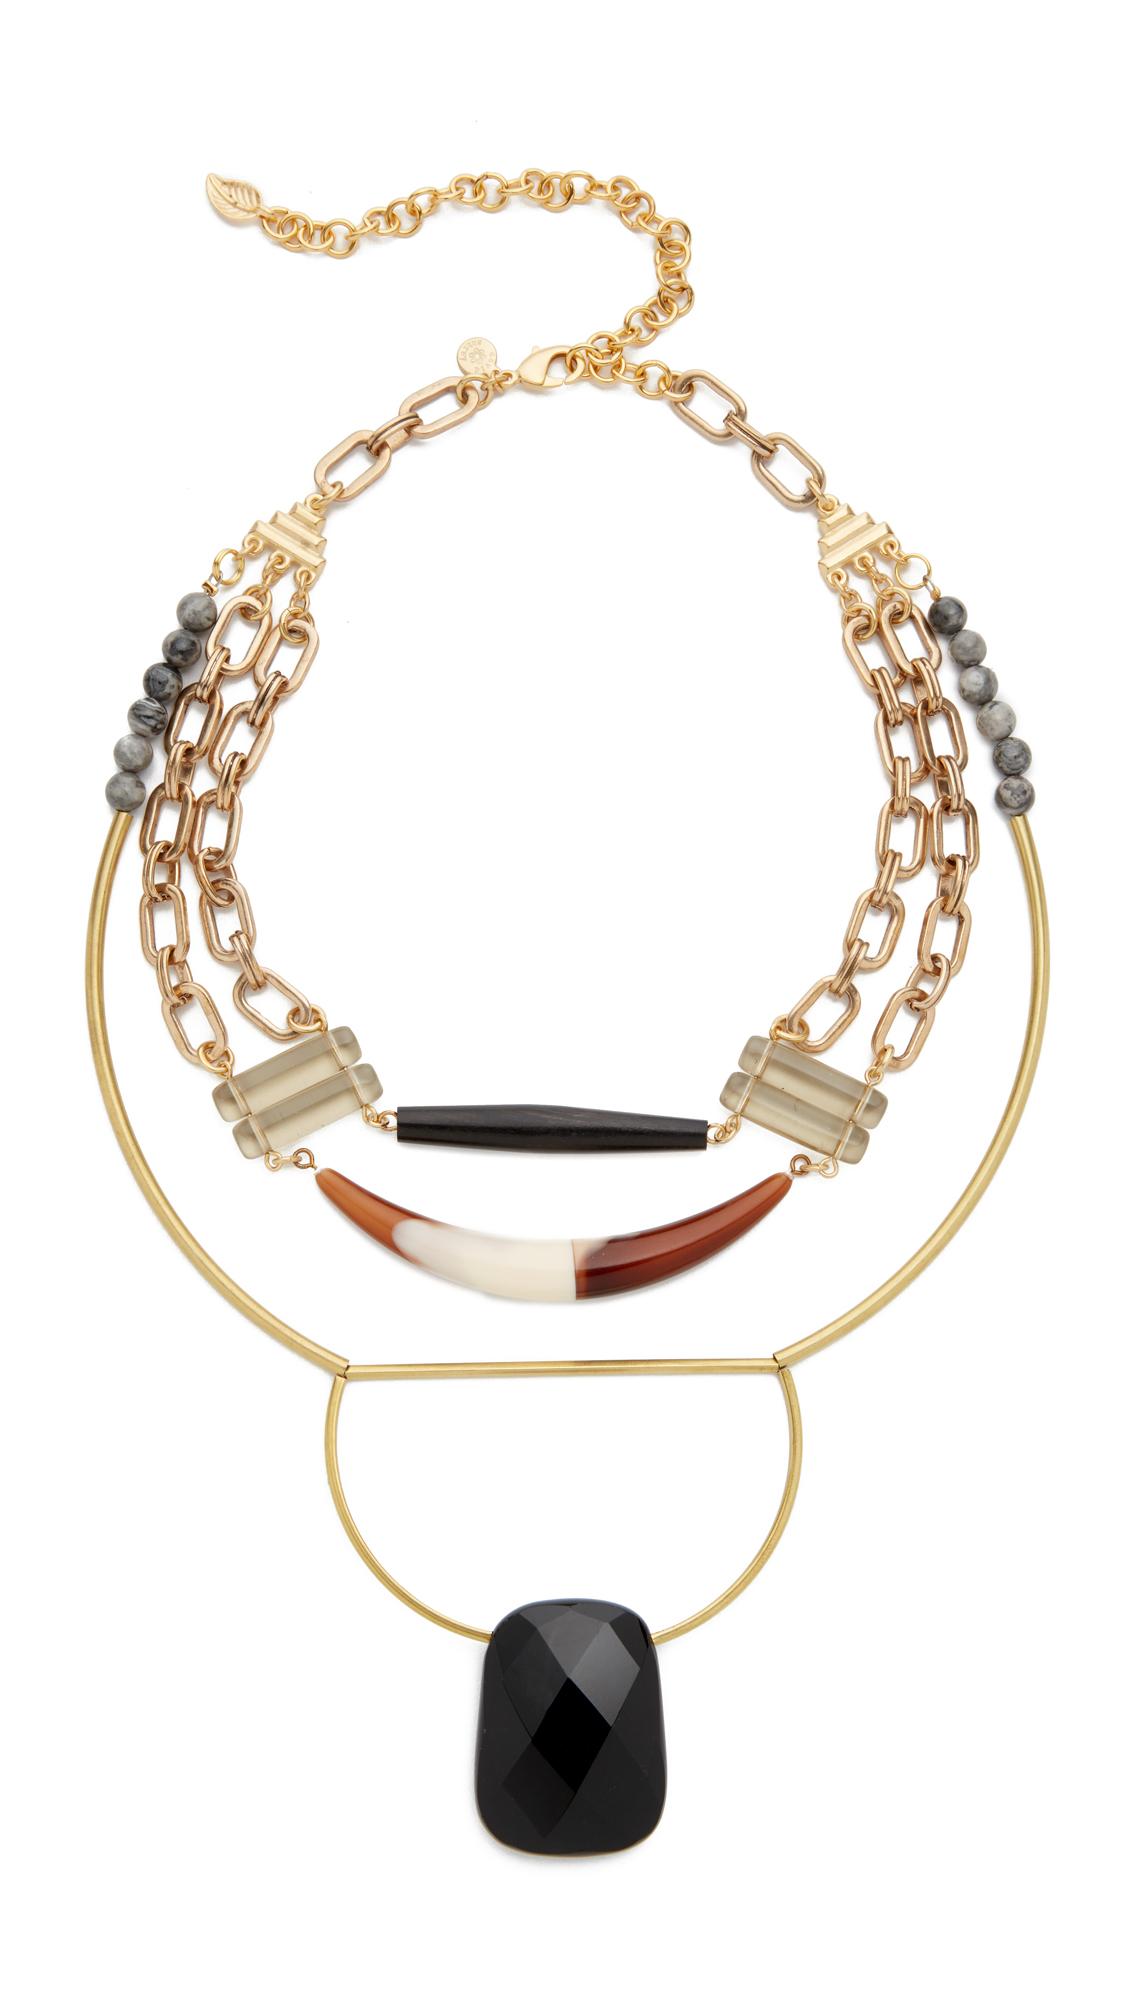 David Aubrey Genesis Necklace - Gold Multi